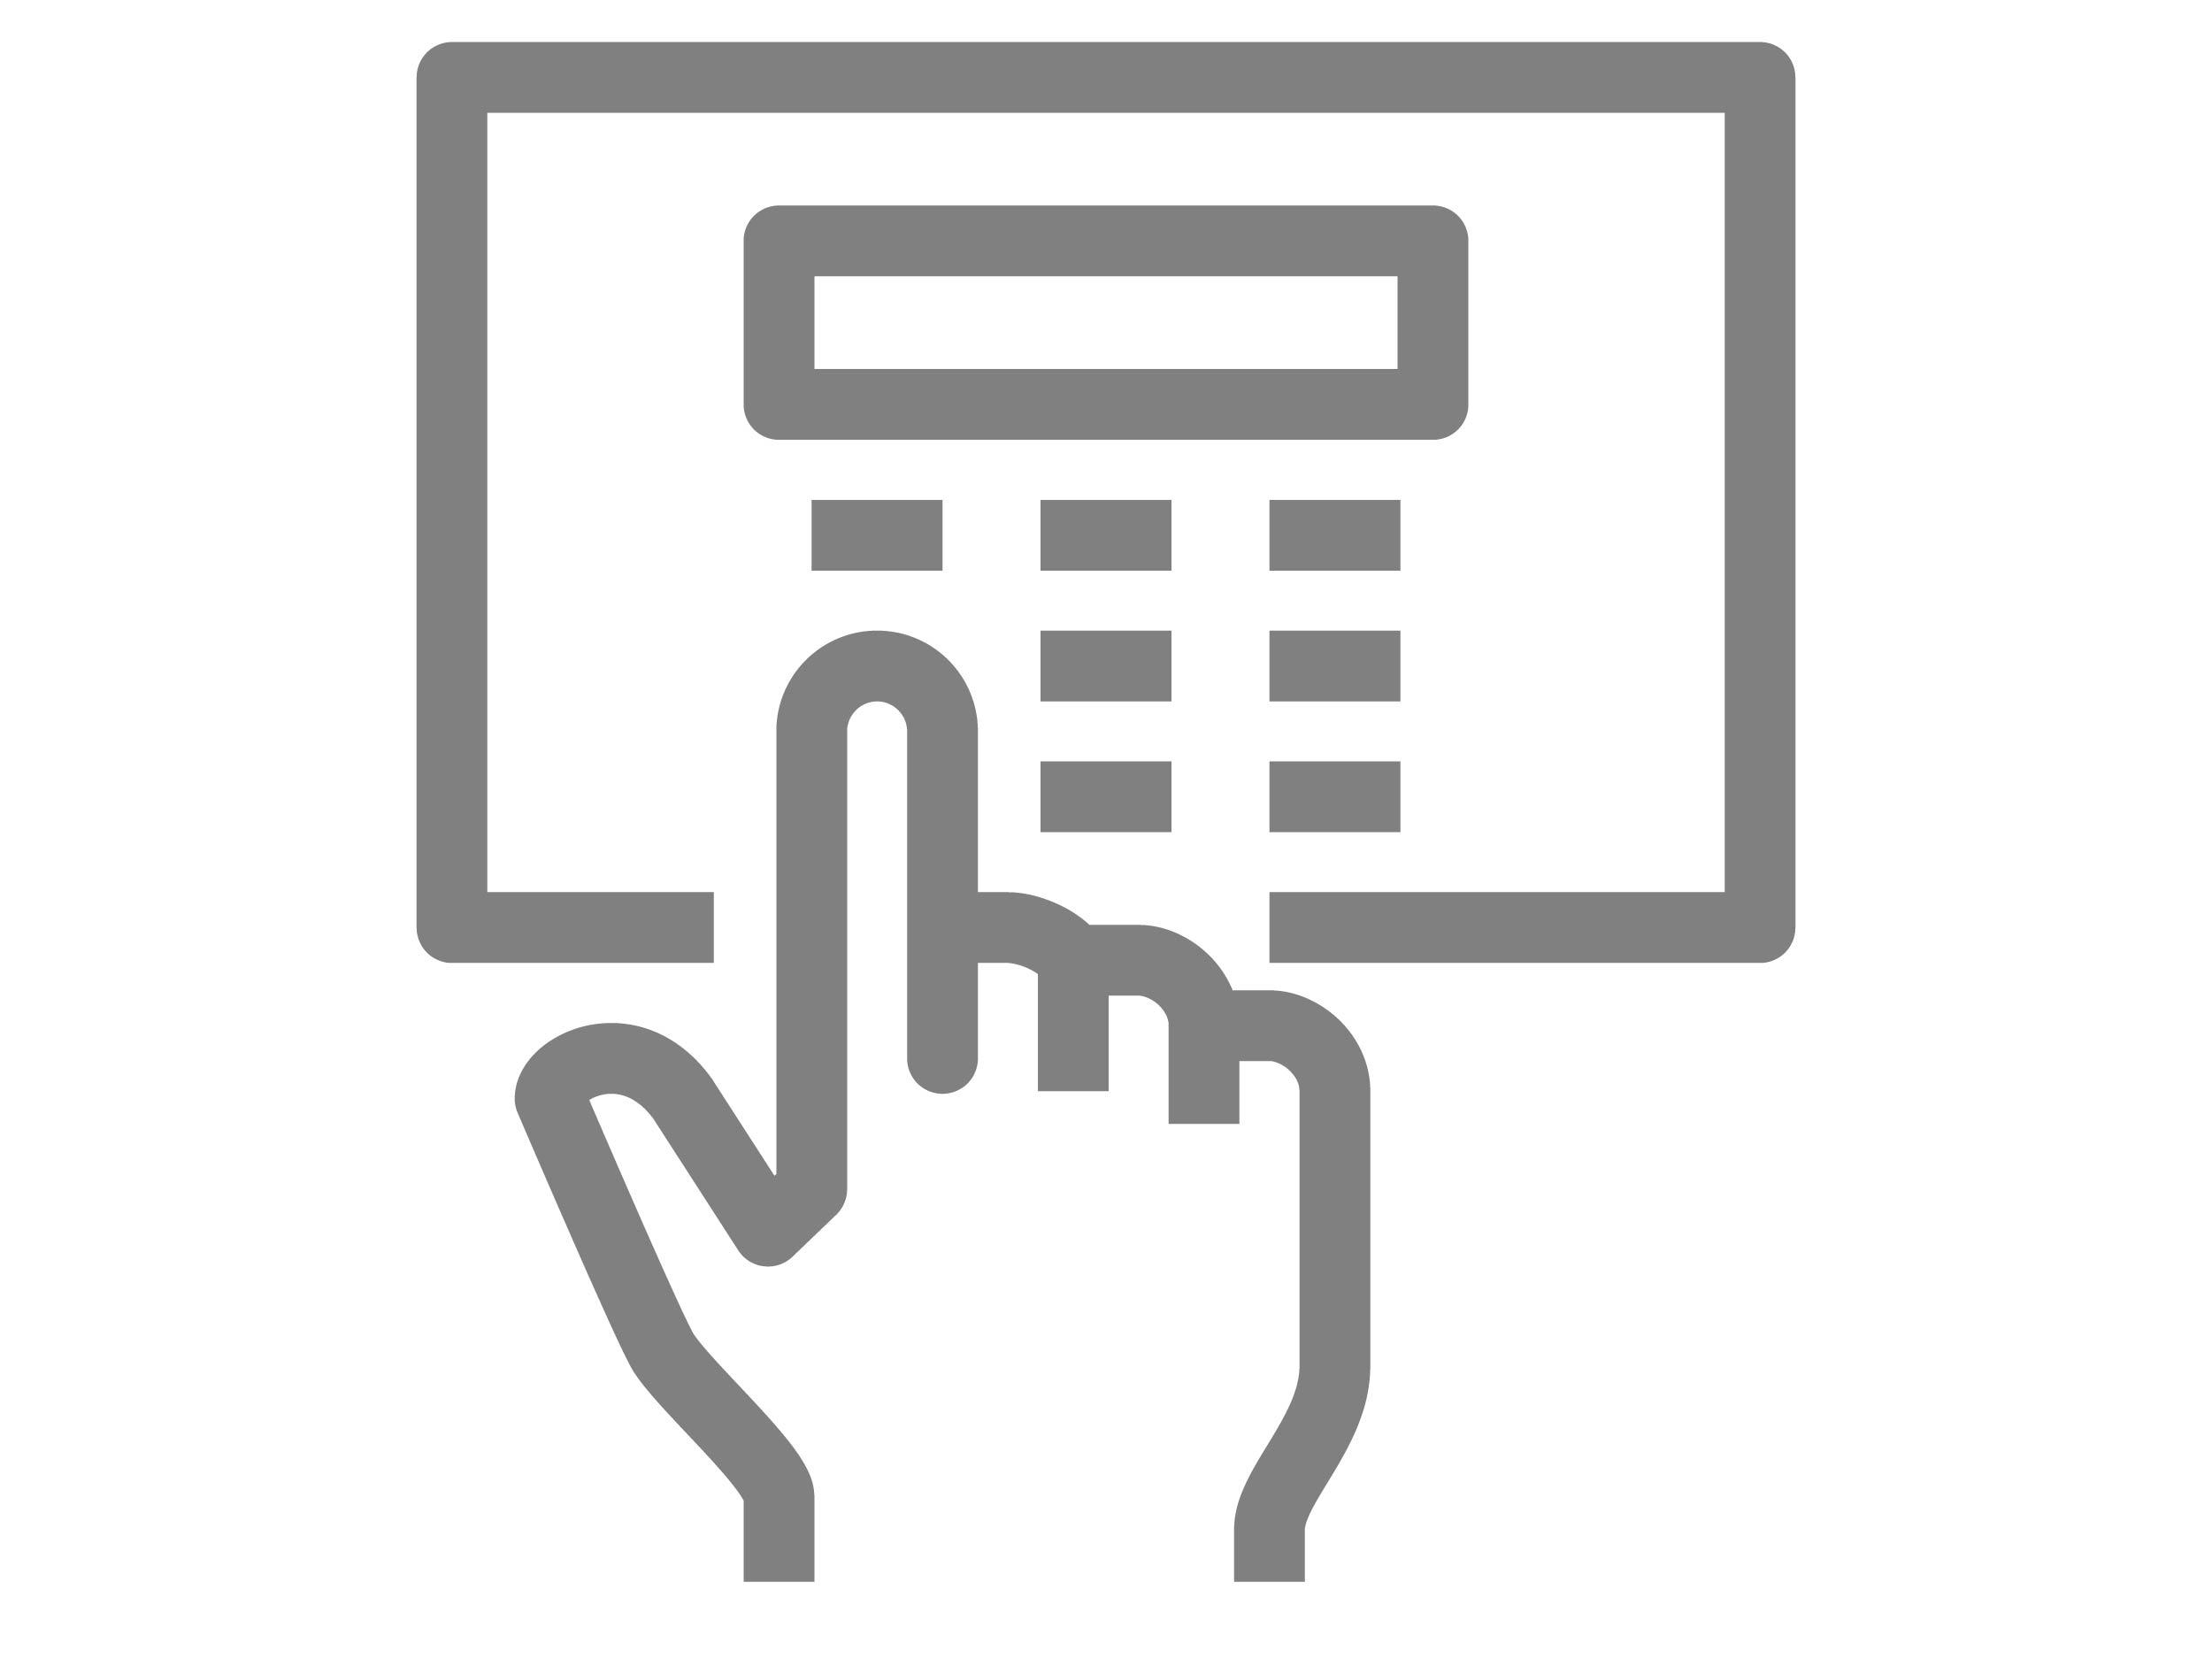 streamline_data_icon.jpg